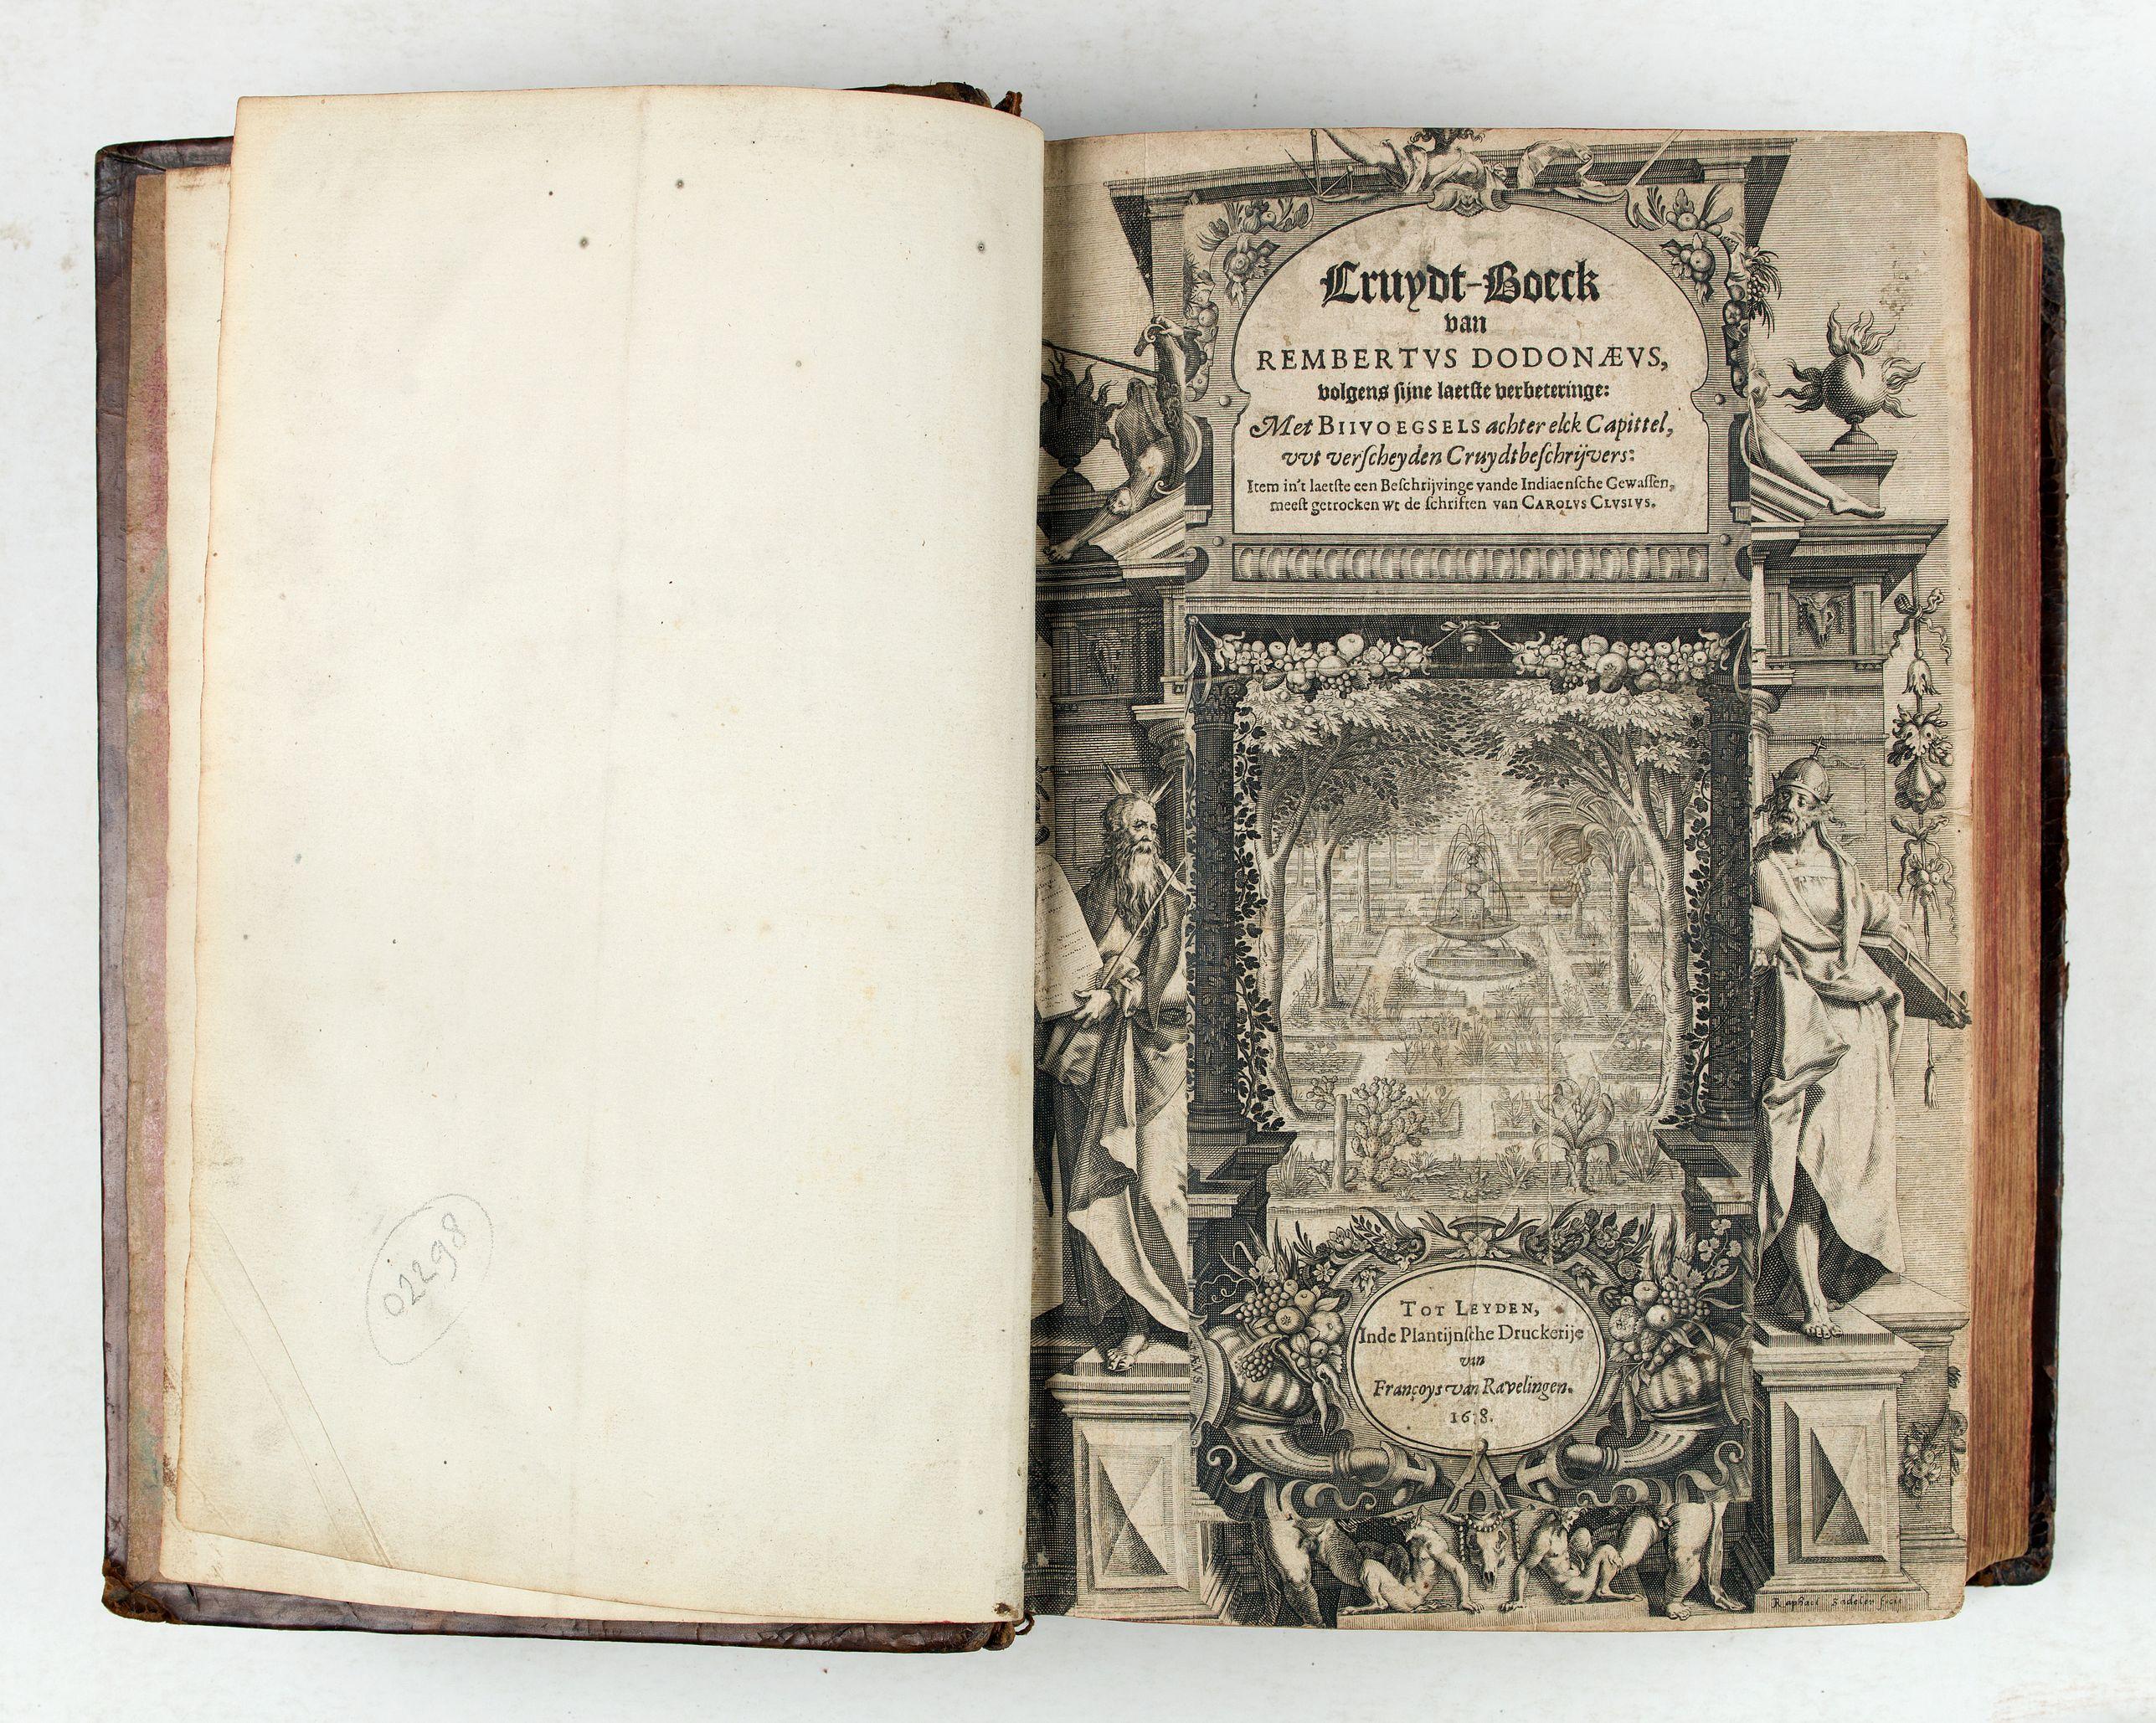 DODONAEUS, R. -  Cruydt-Boeck van Remberus Dodonaeus. . .